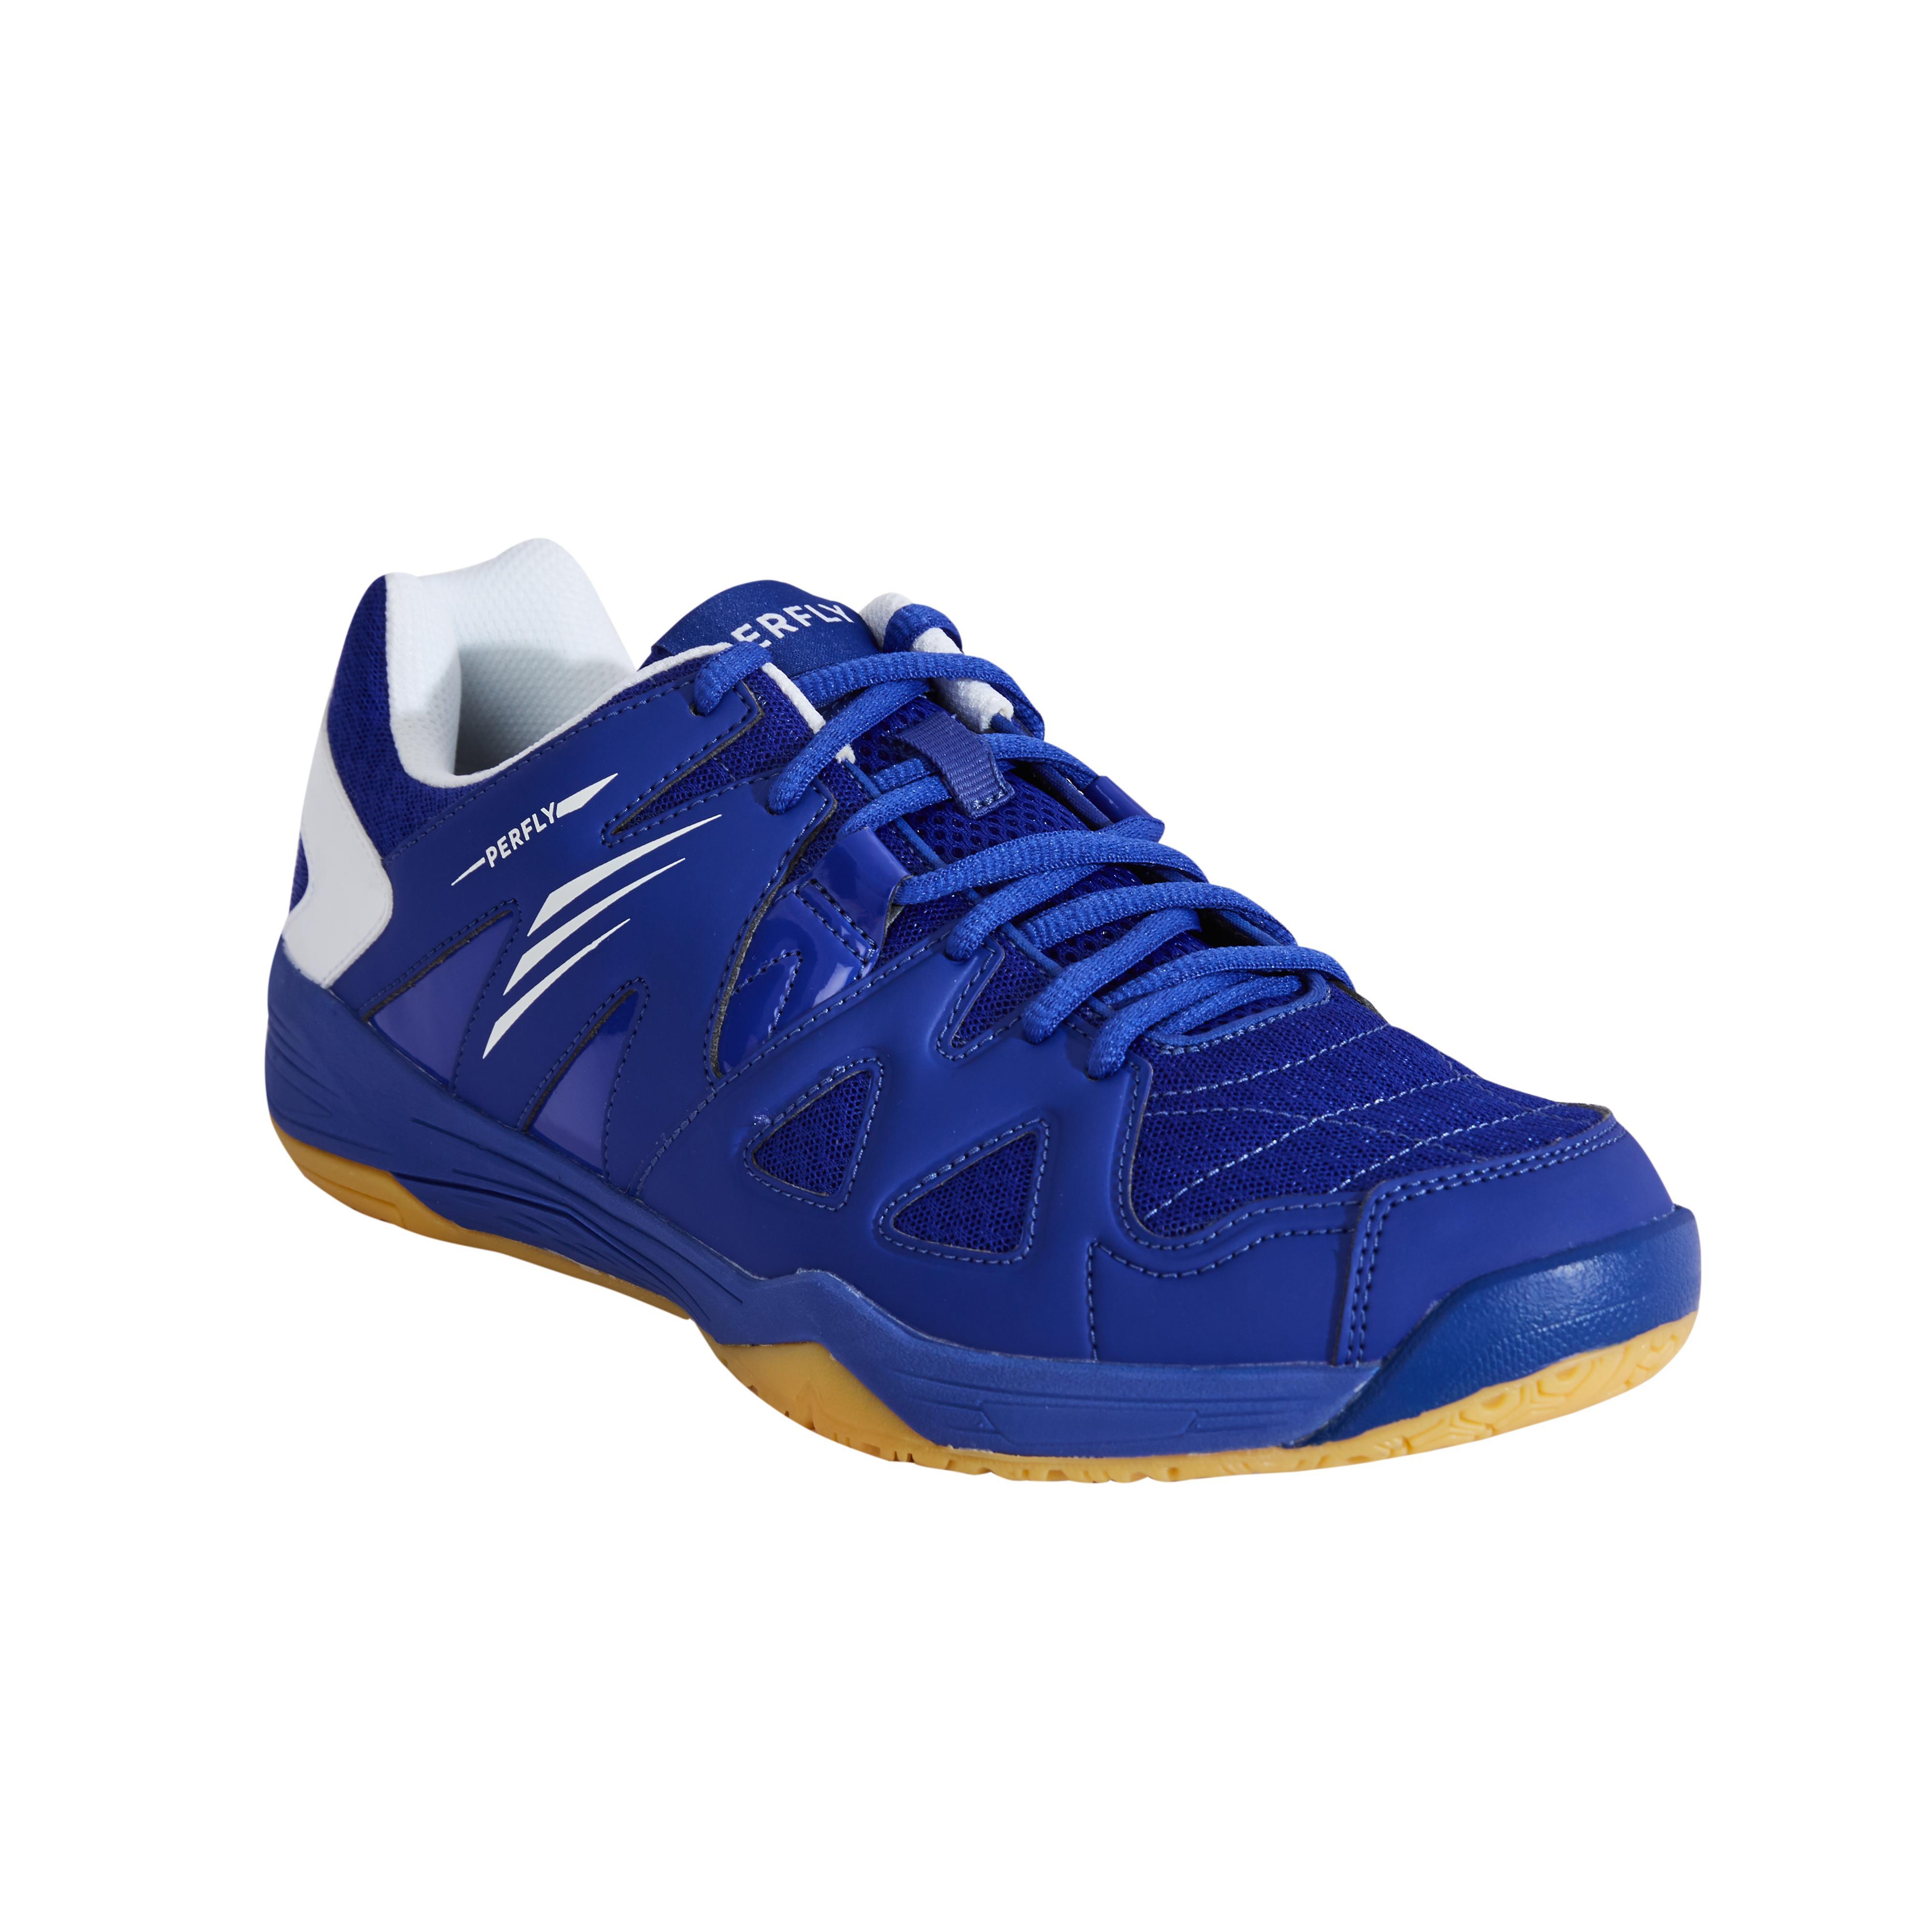 PERFLY Chaussures De Badminton pour Homme BS530 - Bleu - PERFLY - 40